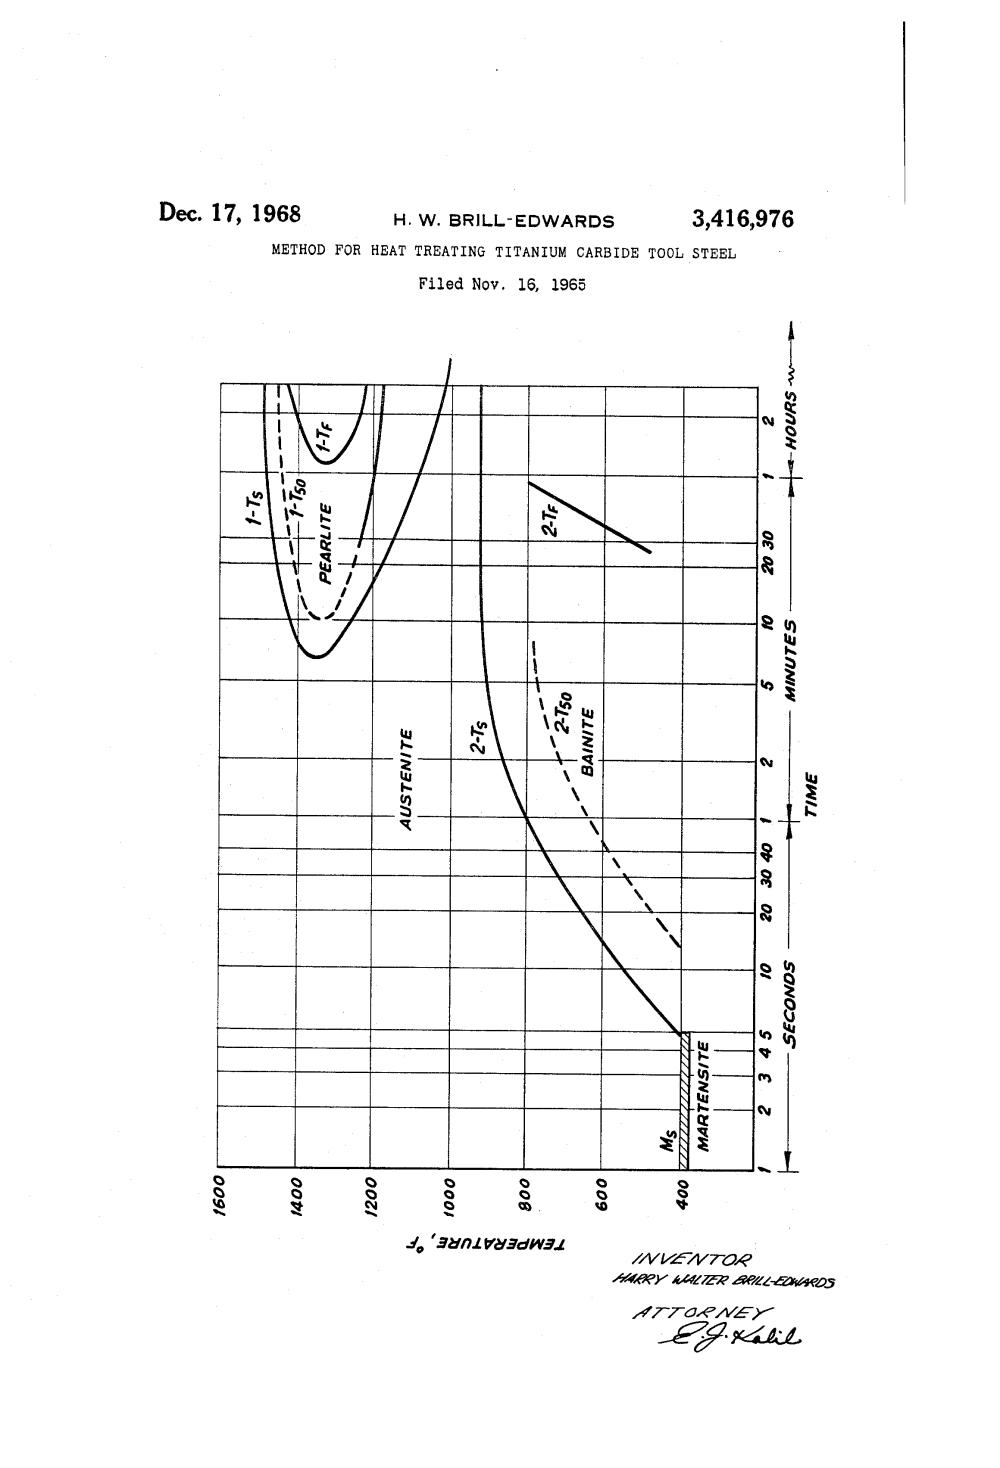 medium resolution of patent us3416976 method for heat treating titanium carbide tool steel google patents